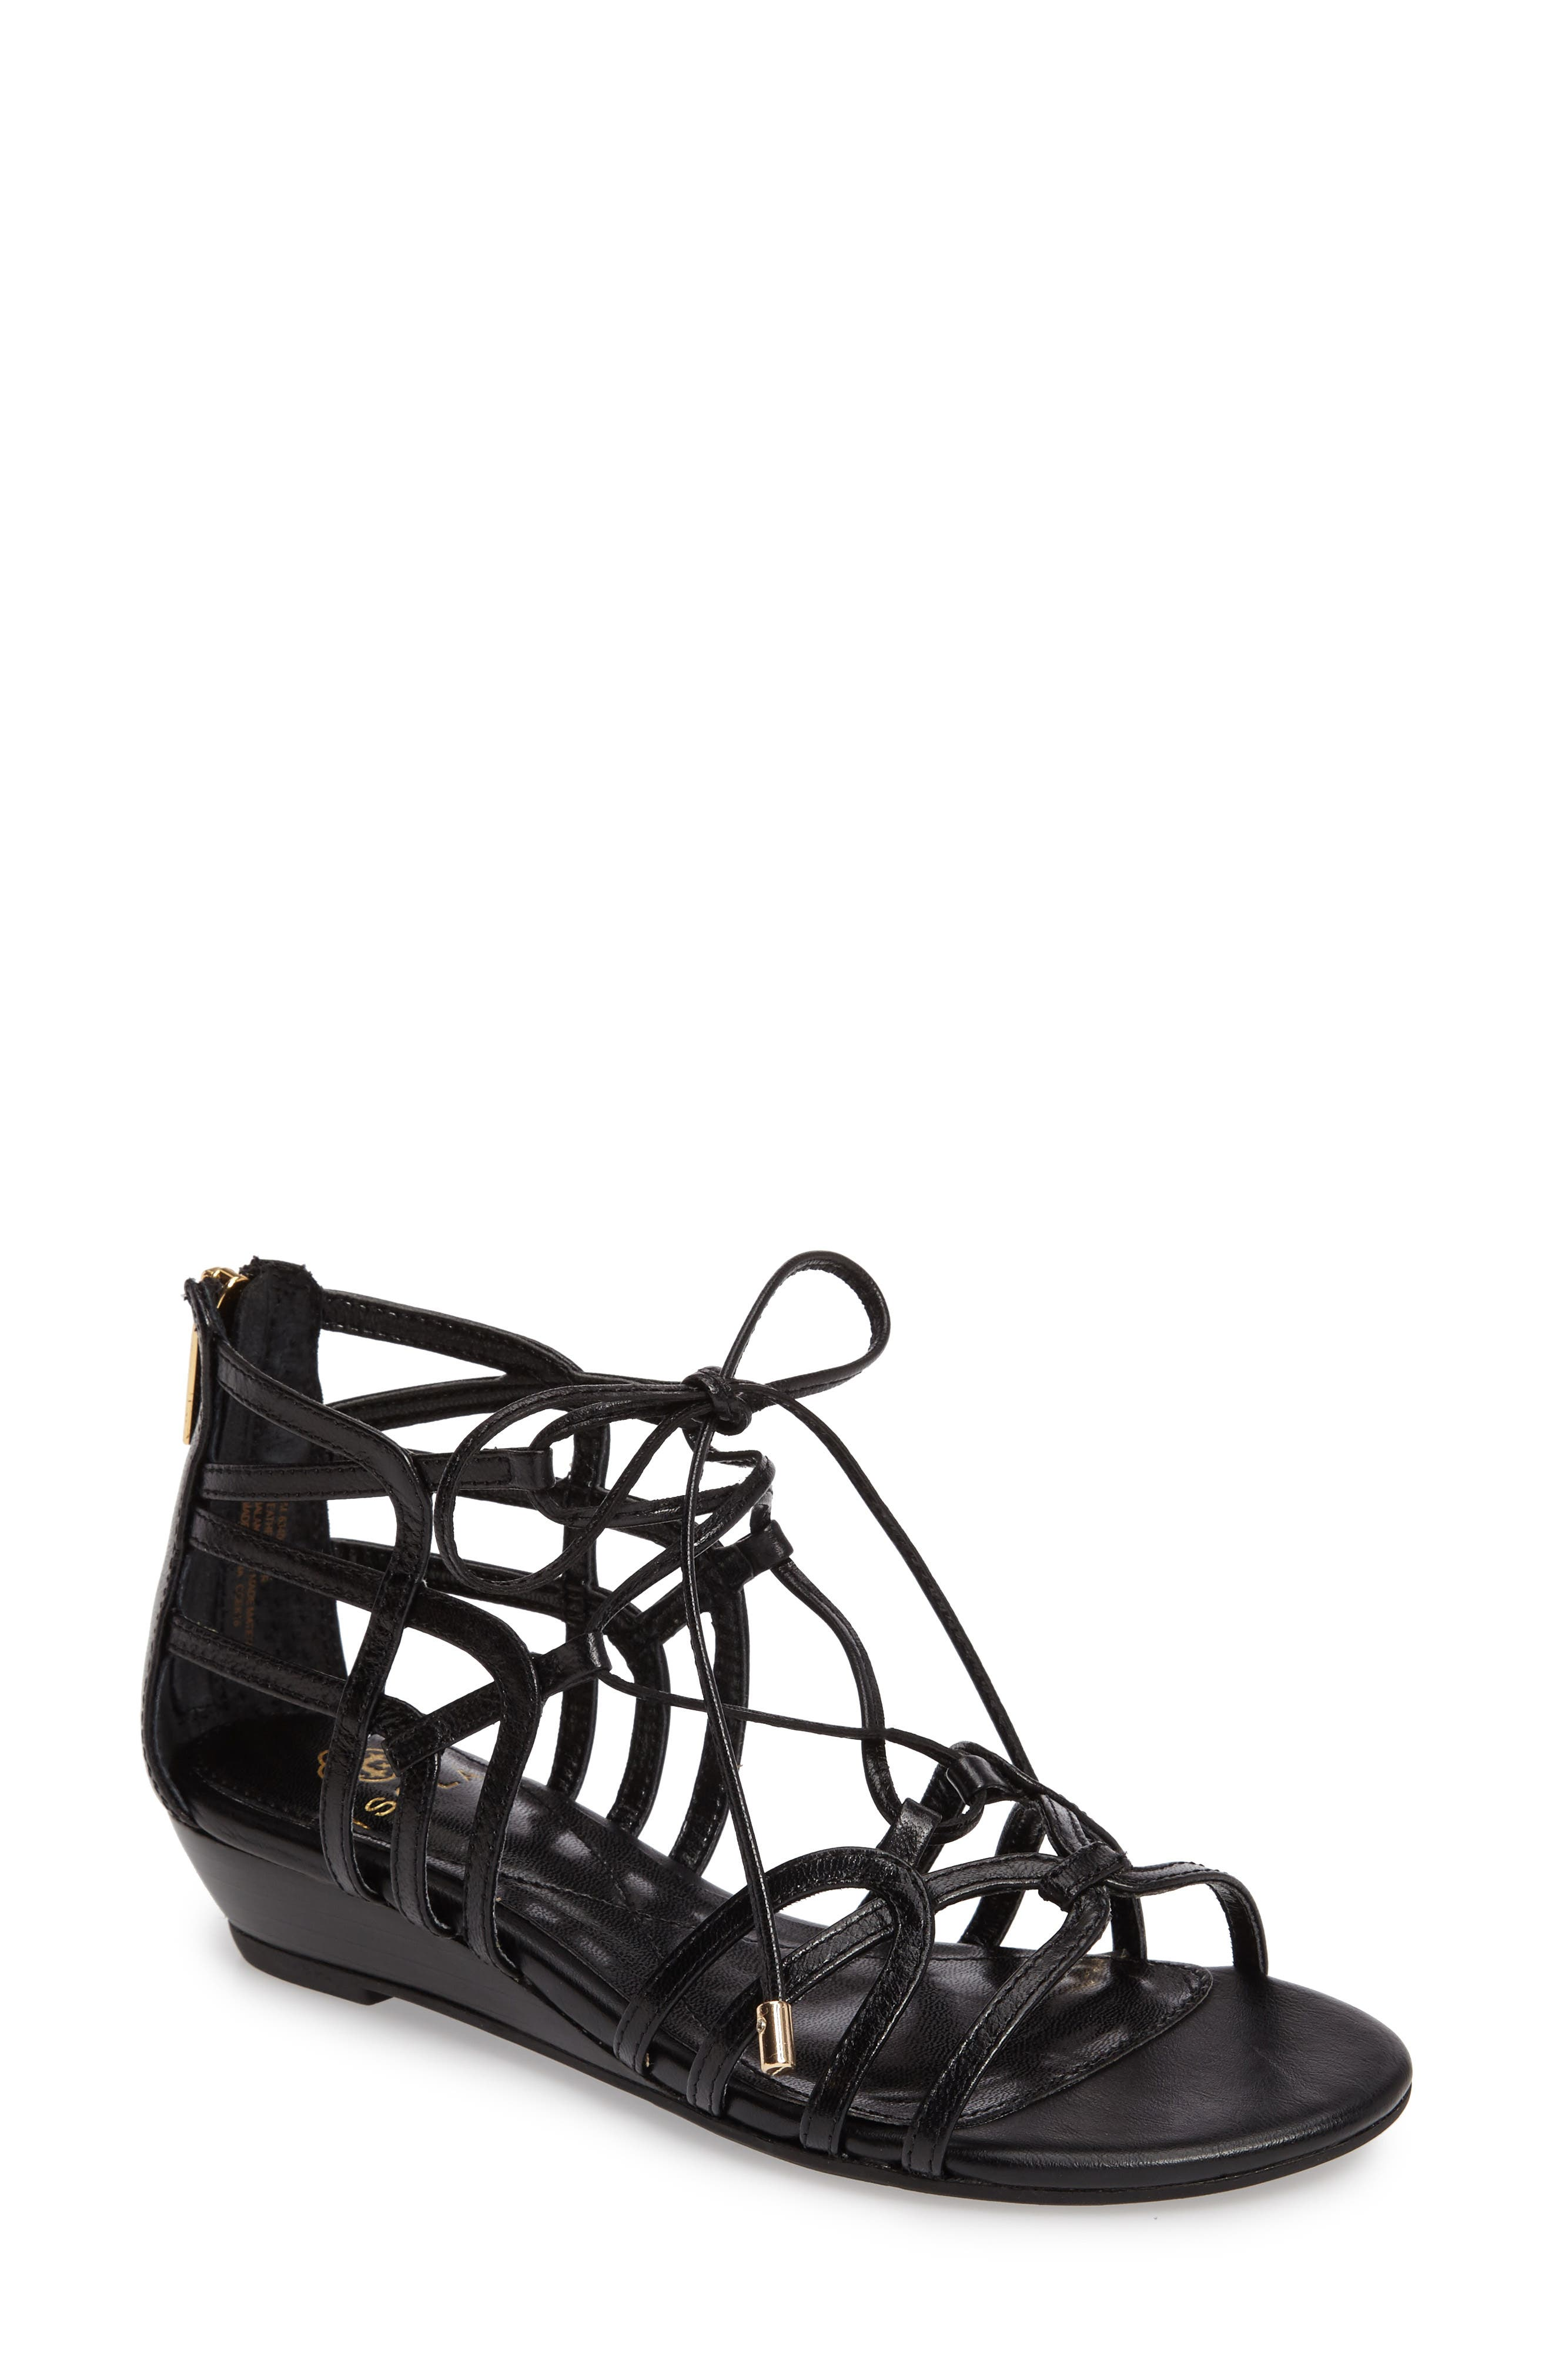 Elisia Lace-Up Sandal,                         Main,                         color, BLACK LEATHER